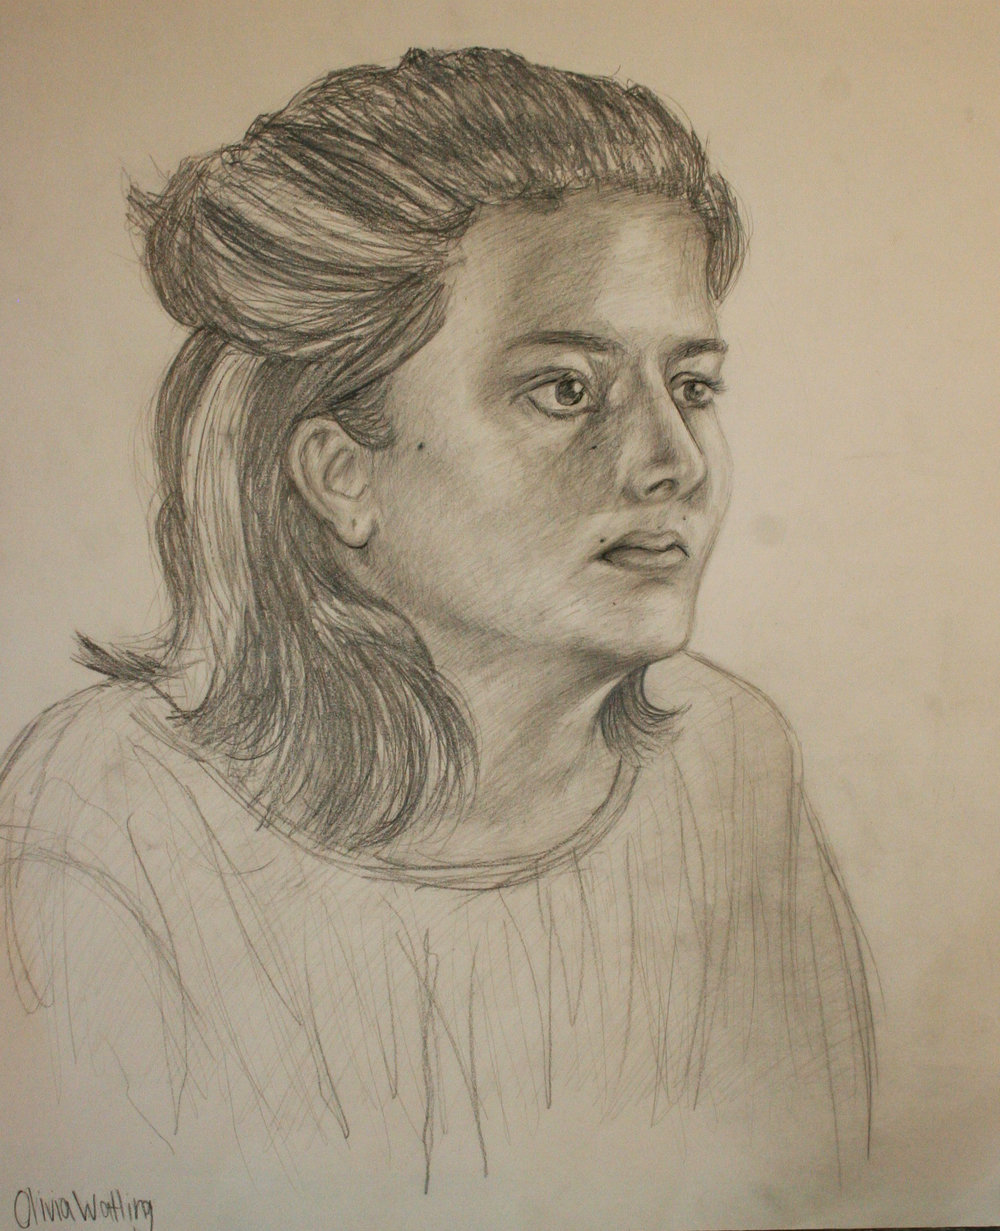 Olivia Watling did this drawing.